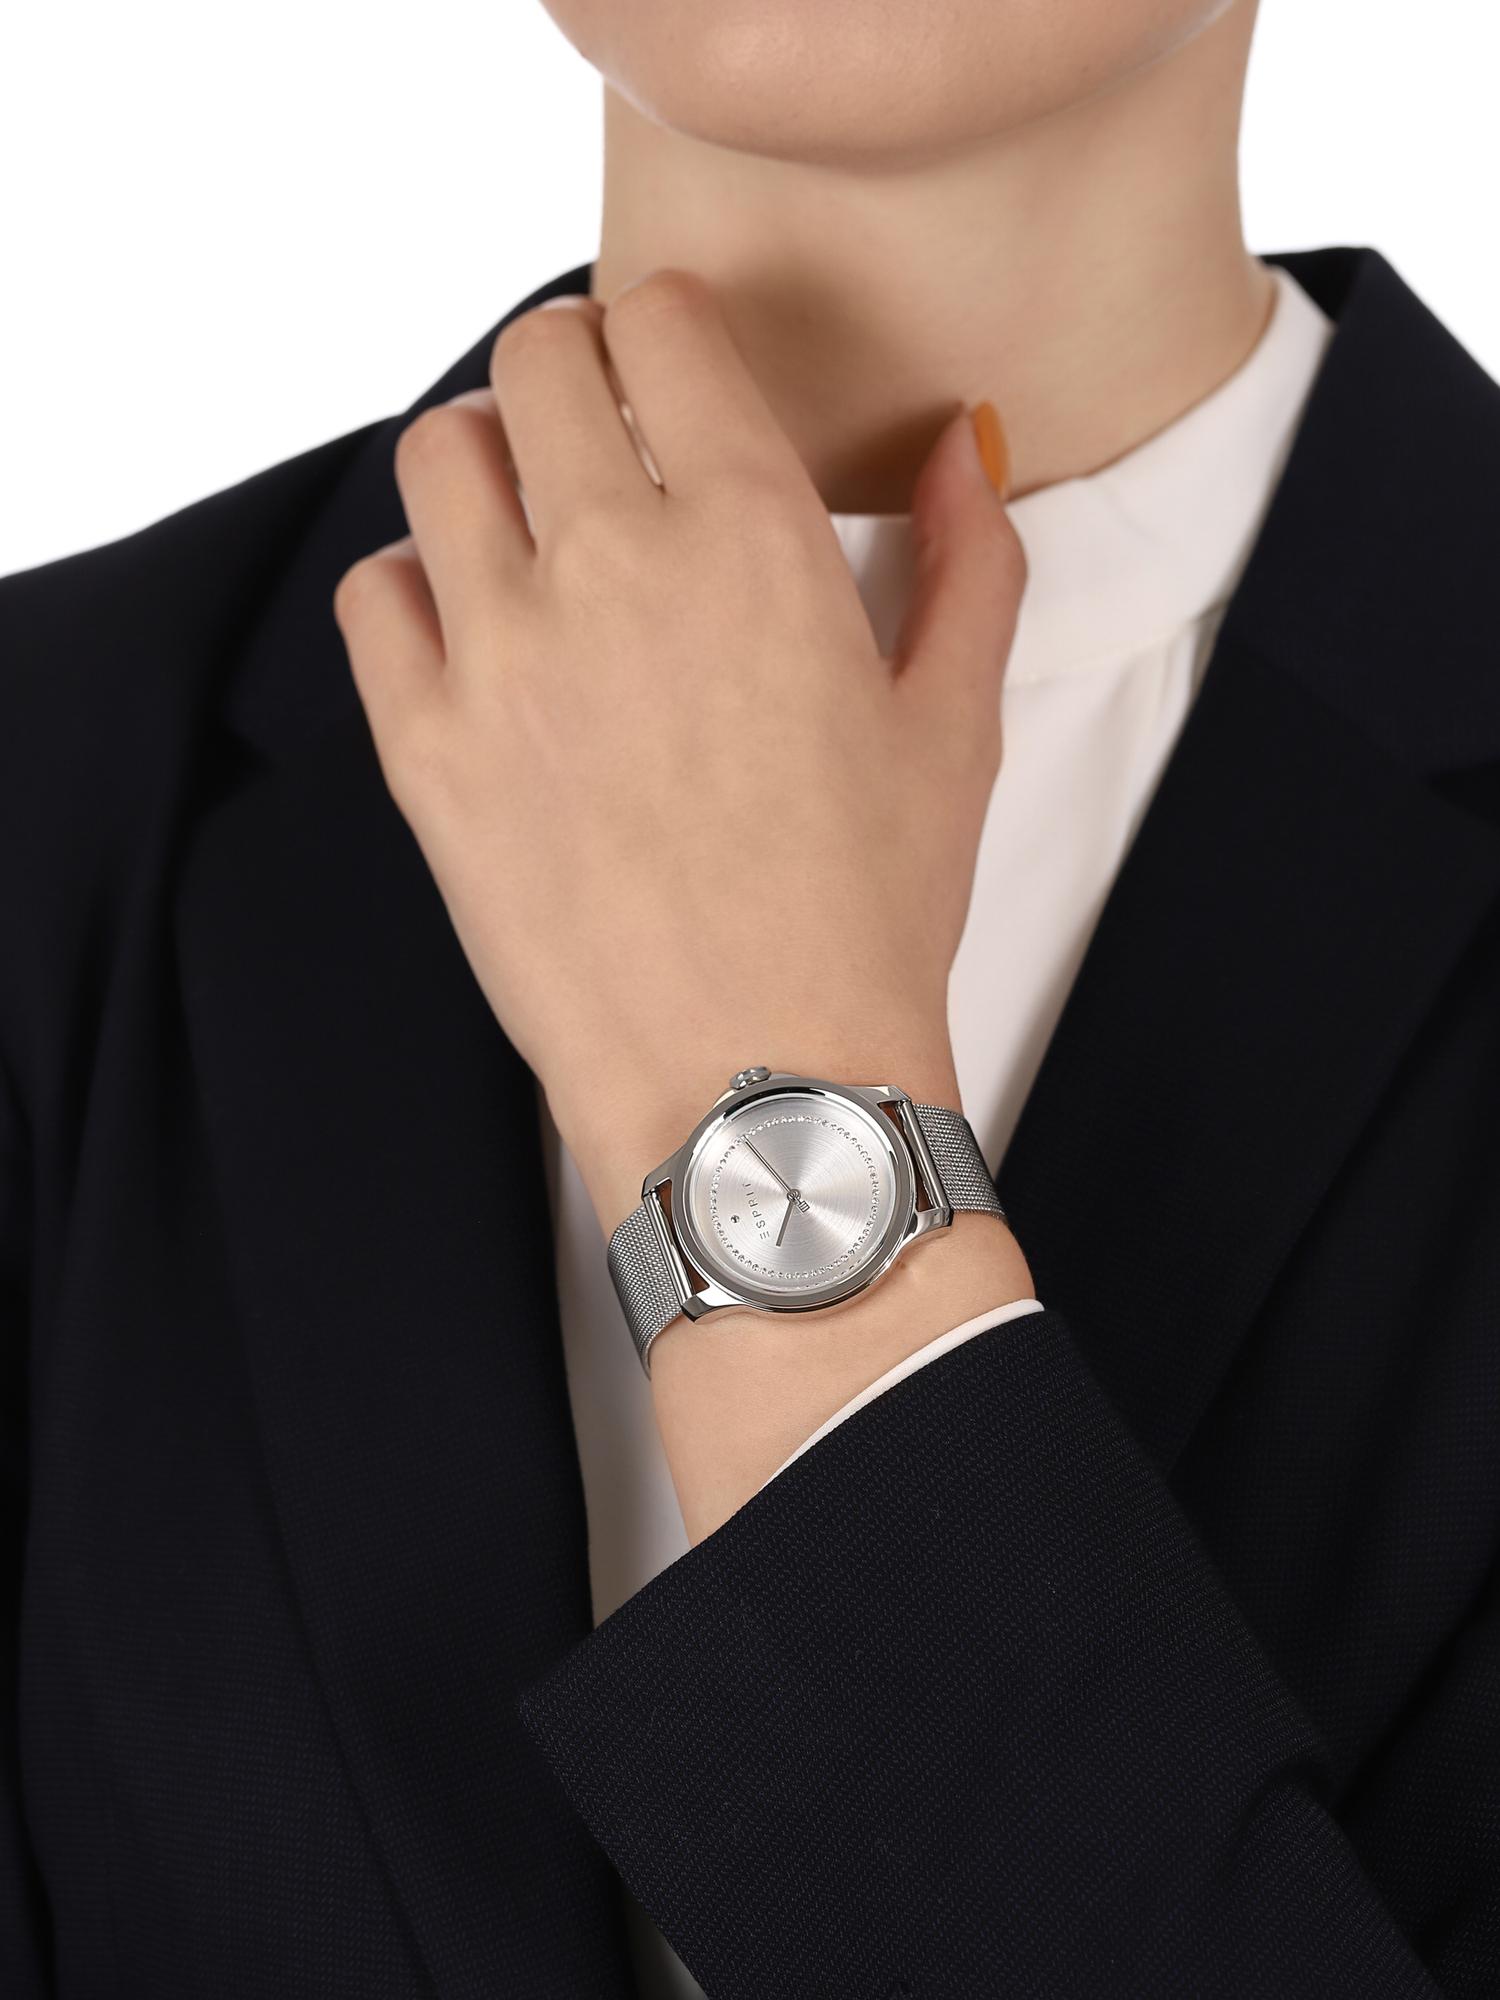 Esprit ES1L147M0055 zegarek srebrny klasyczny Damskie bransoleta